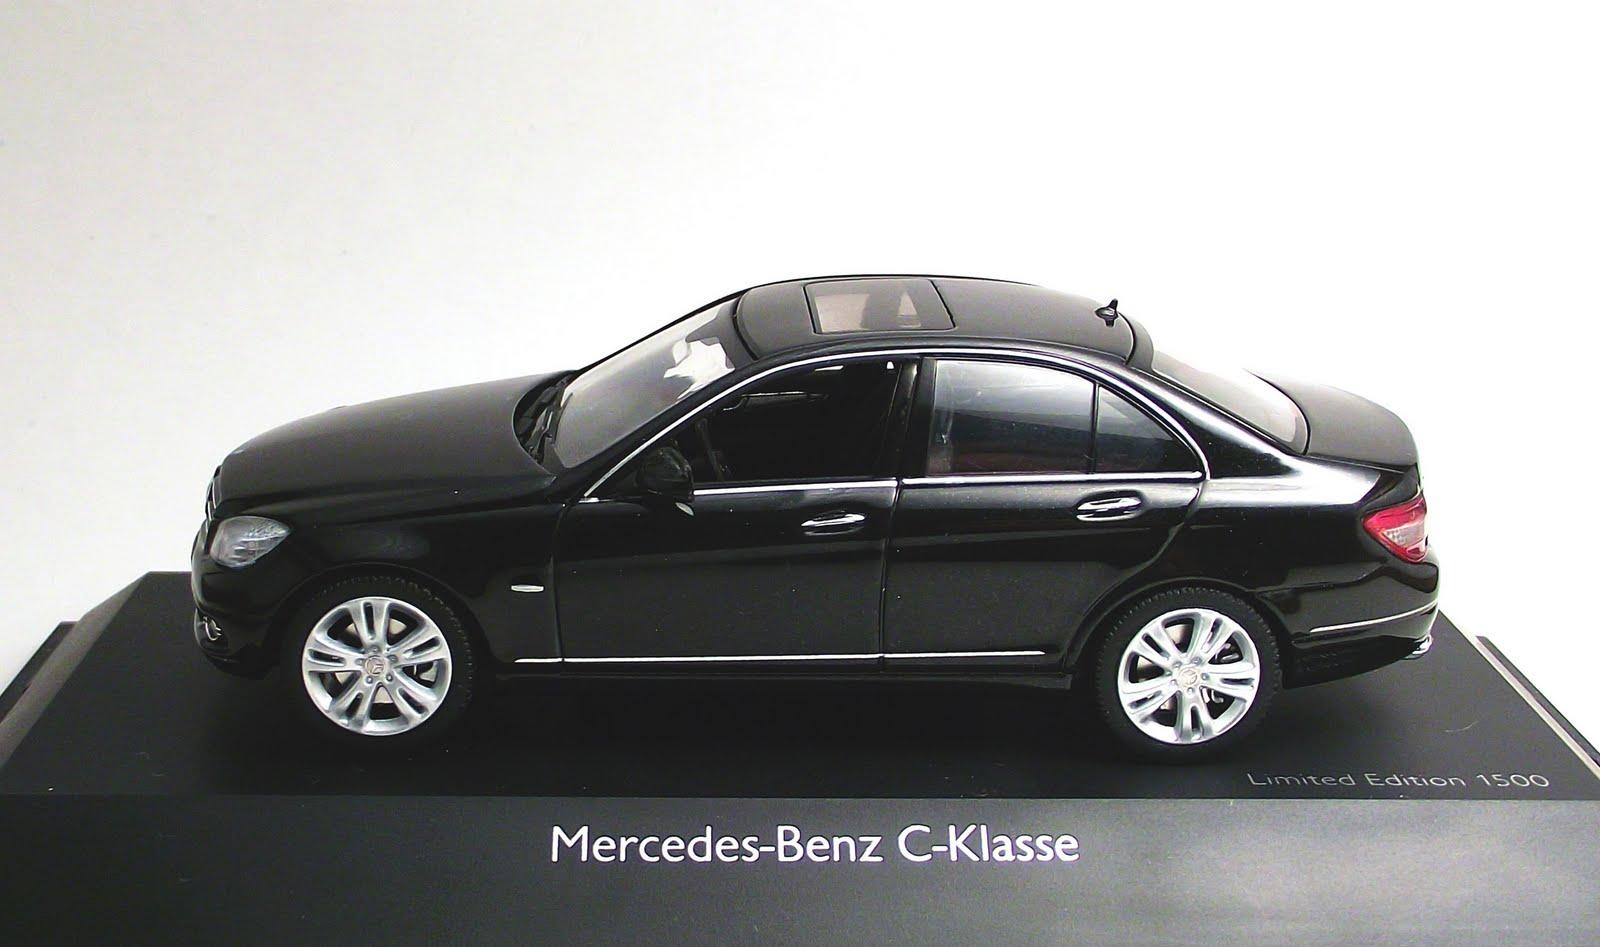 diecast 1 43 mercedes benz c klasse avantgarde limousine 1 43 schuco. Black Bedroom Furniture Sets. Home Design Ideas